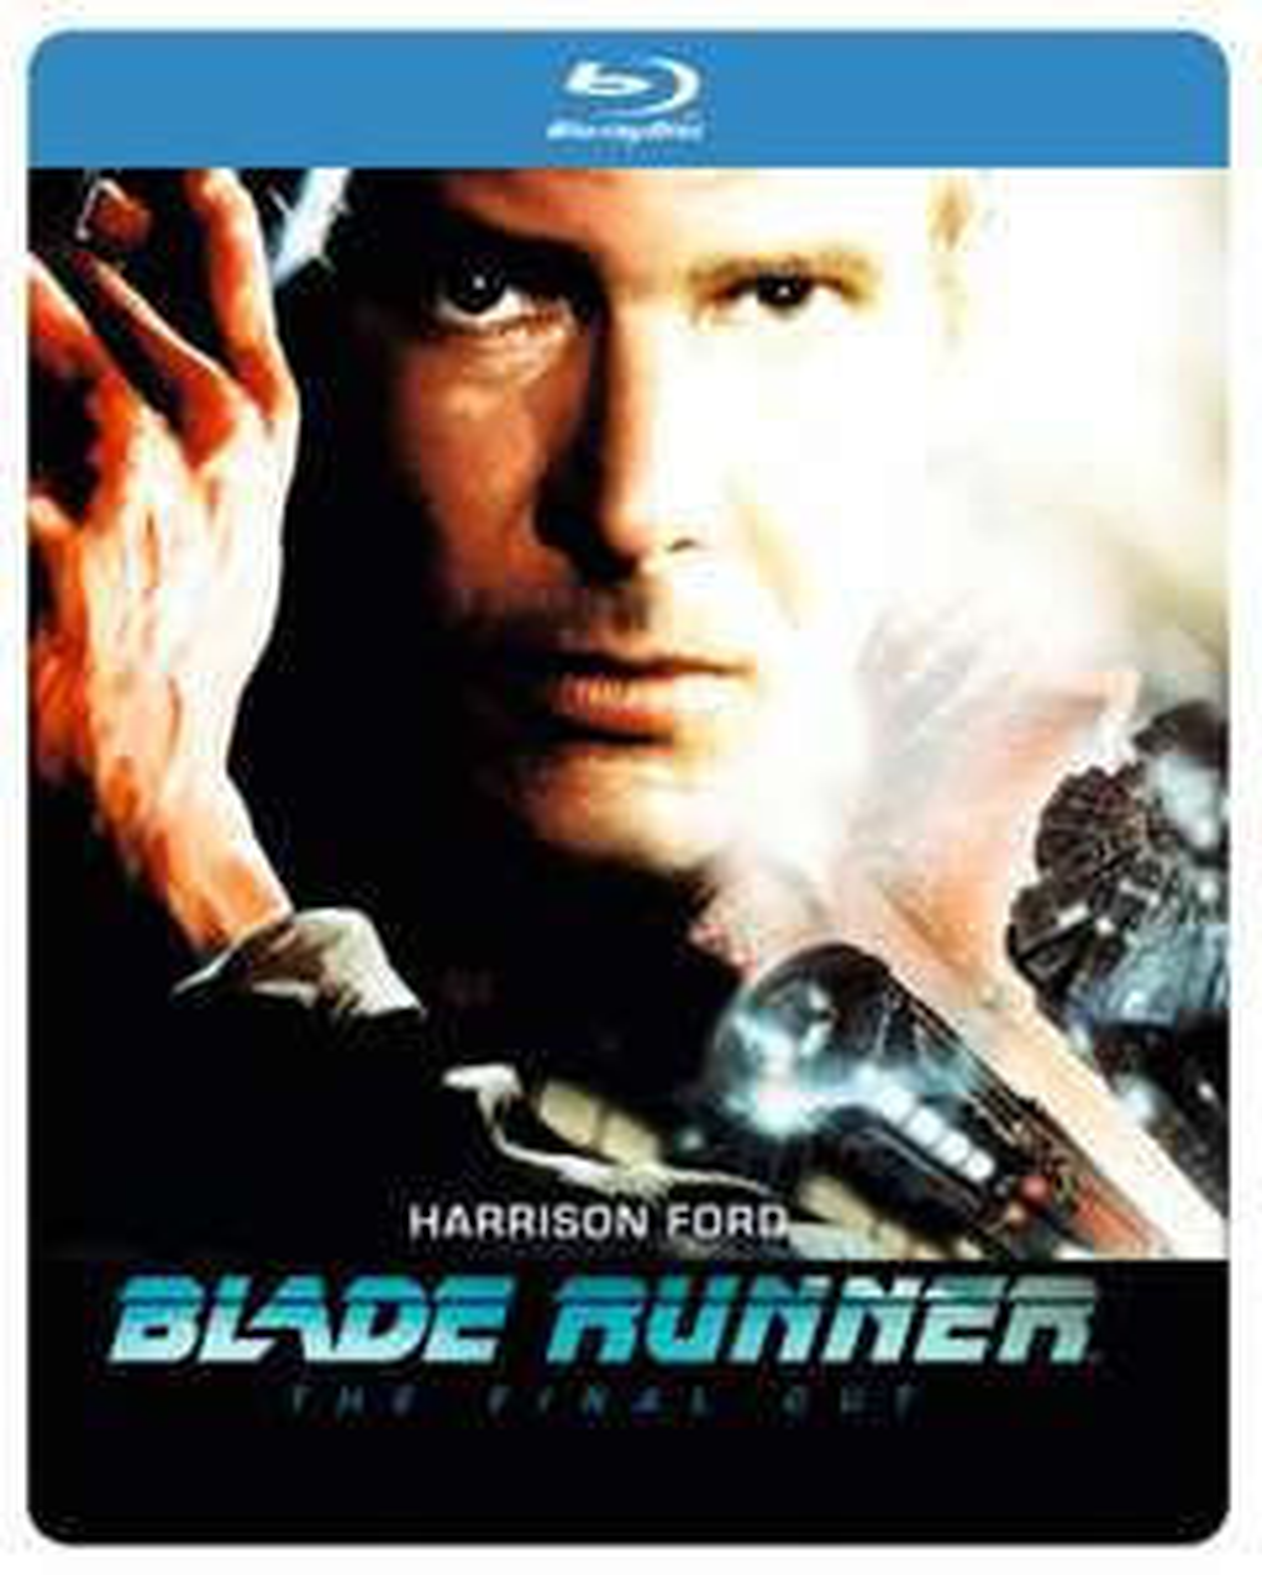 Blade Runner (1982) Blu-Ray Steelbook £12.99 at theentertainmentstore eBay